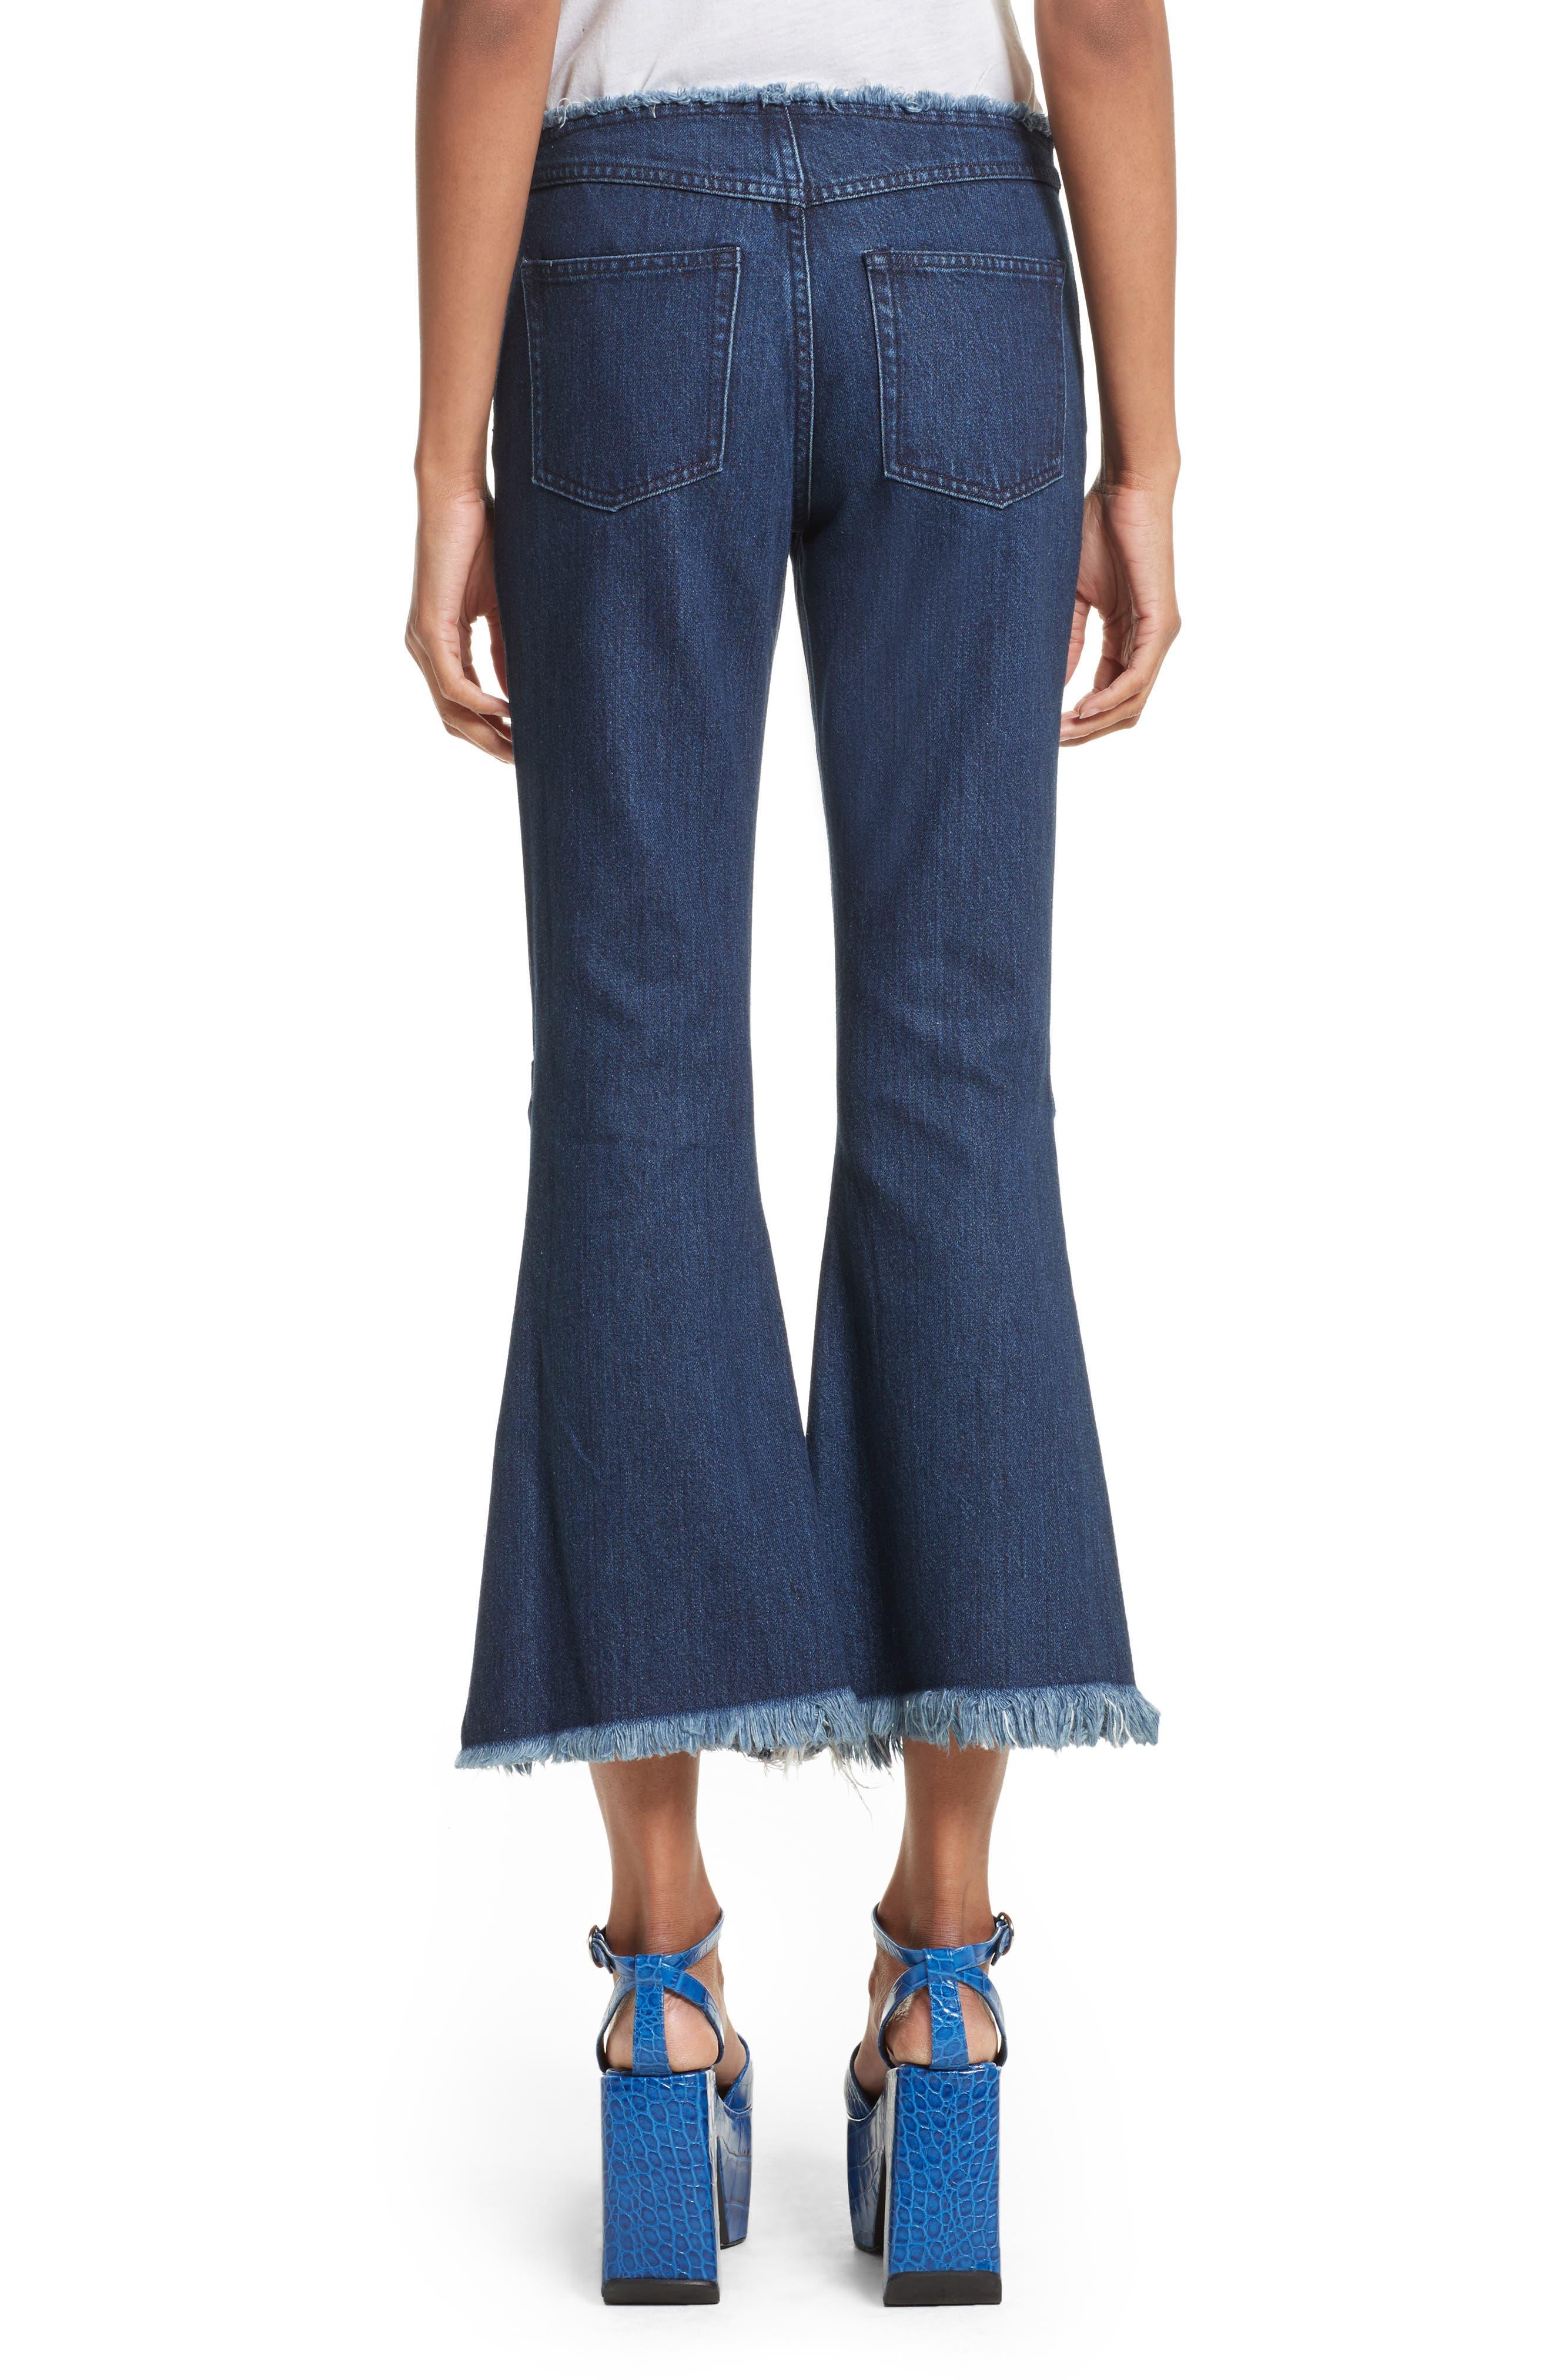 Marques'Almeida Button Trim Crop Flare Jeans,                             Alternate thumbnail 2, color,                             Indigo